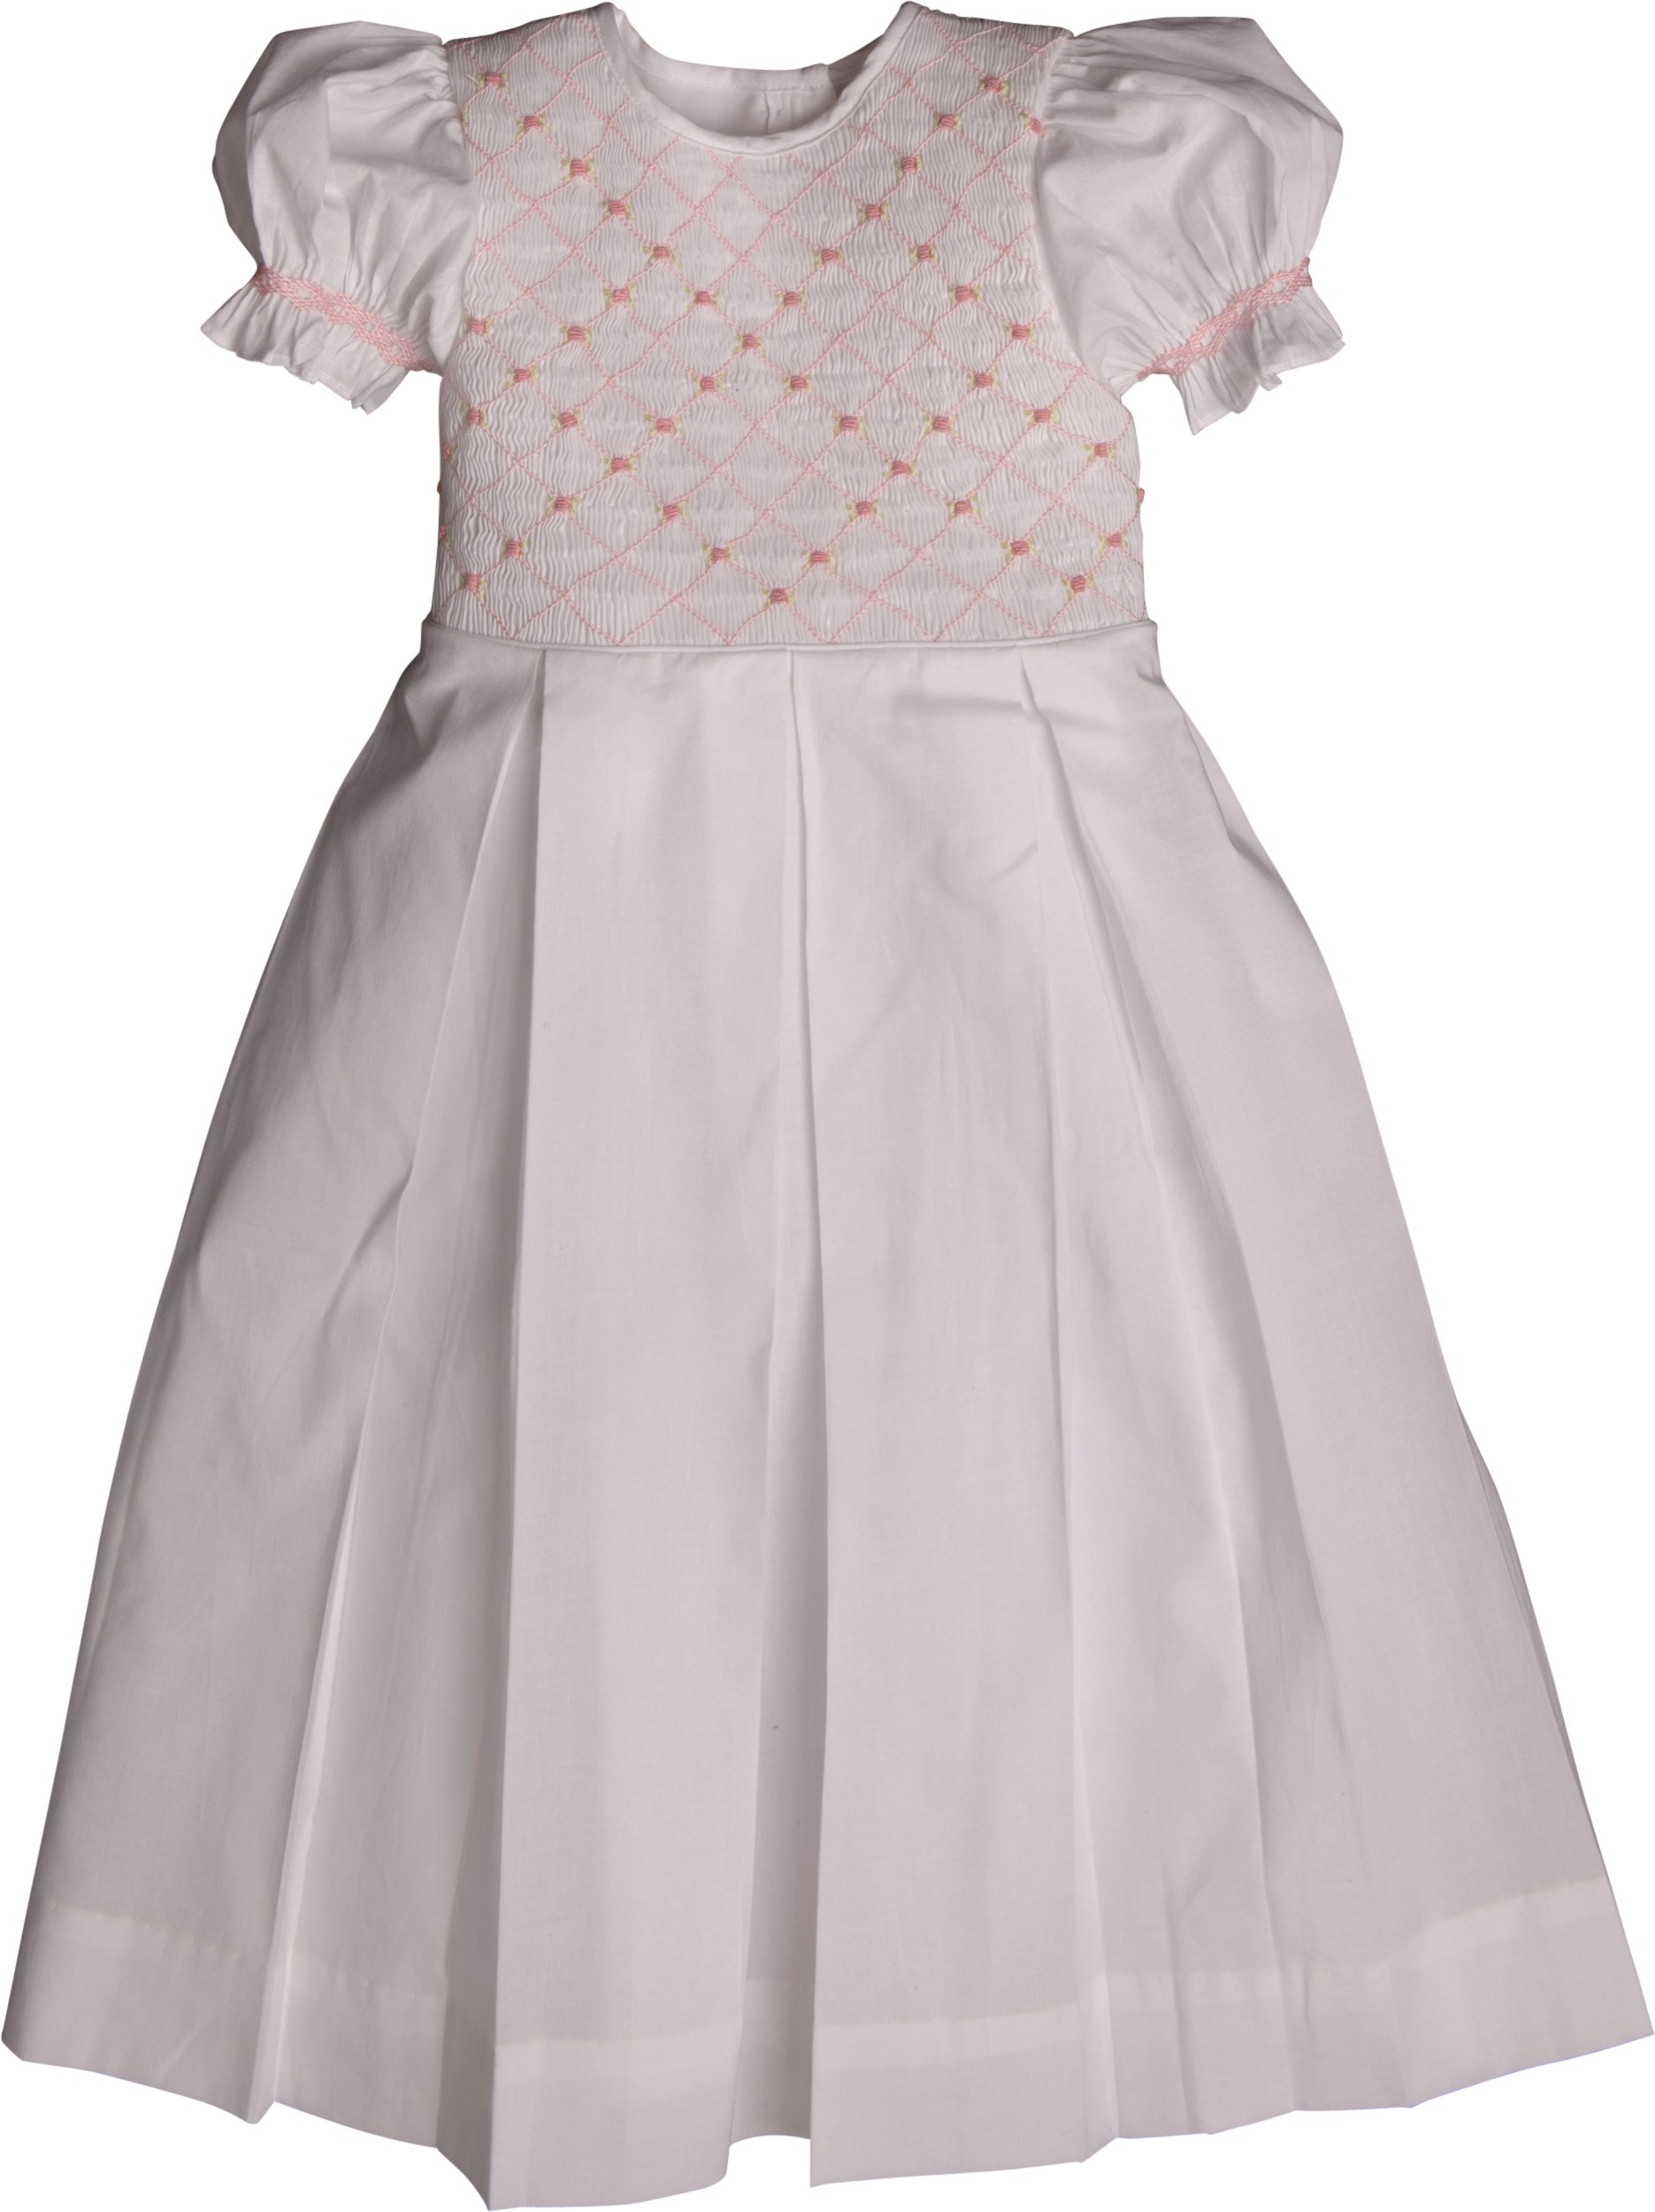 Strasburg Children Little Girls Addison Smocked Dress White With Pink Embroidery Birthday Dress (4)